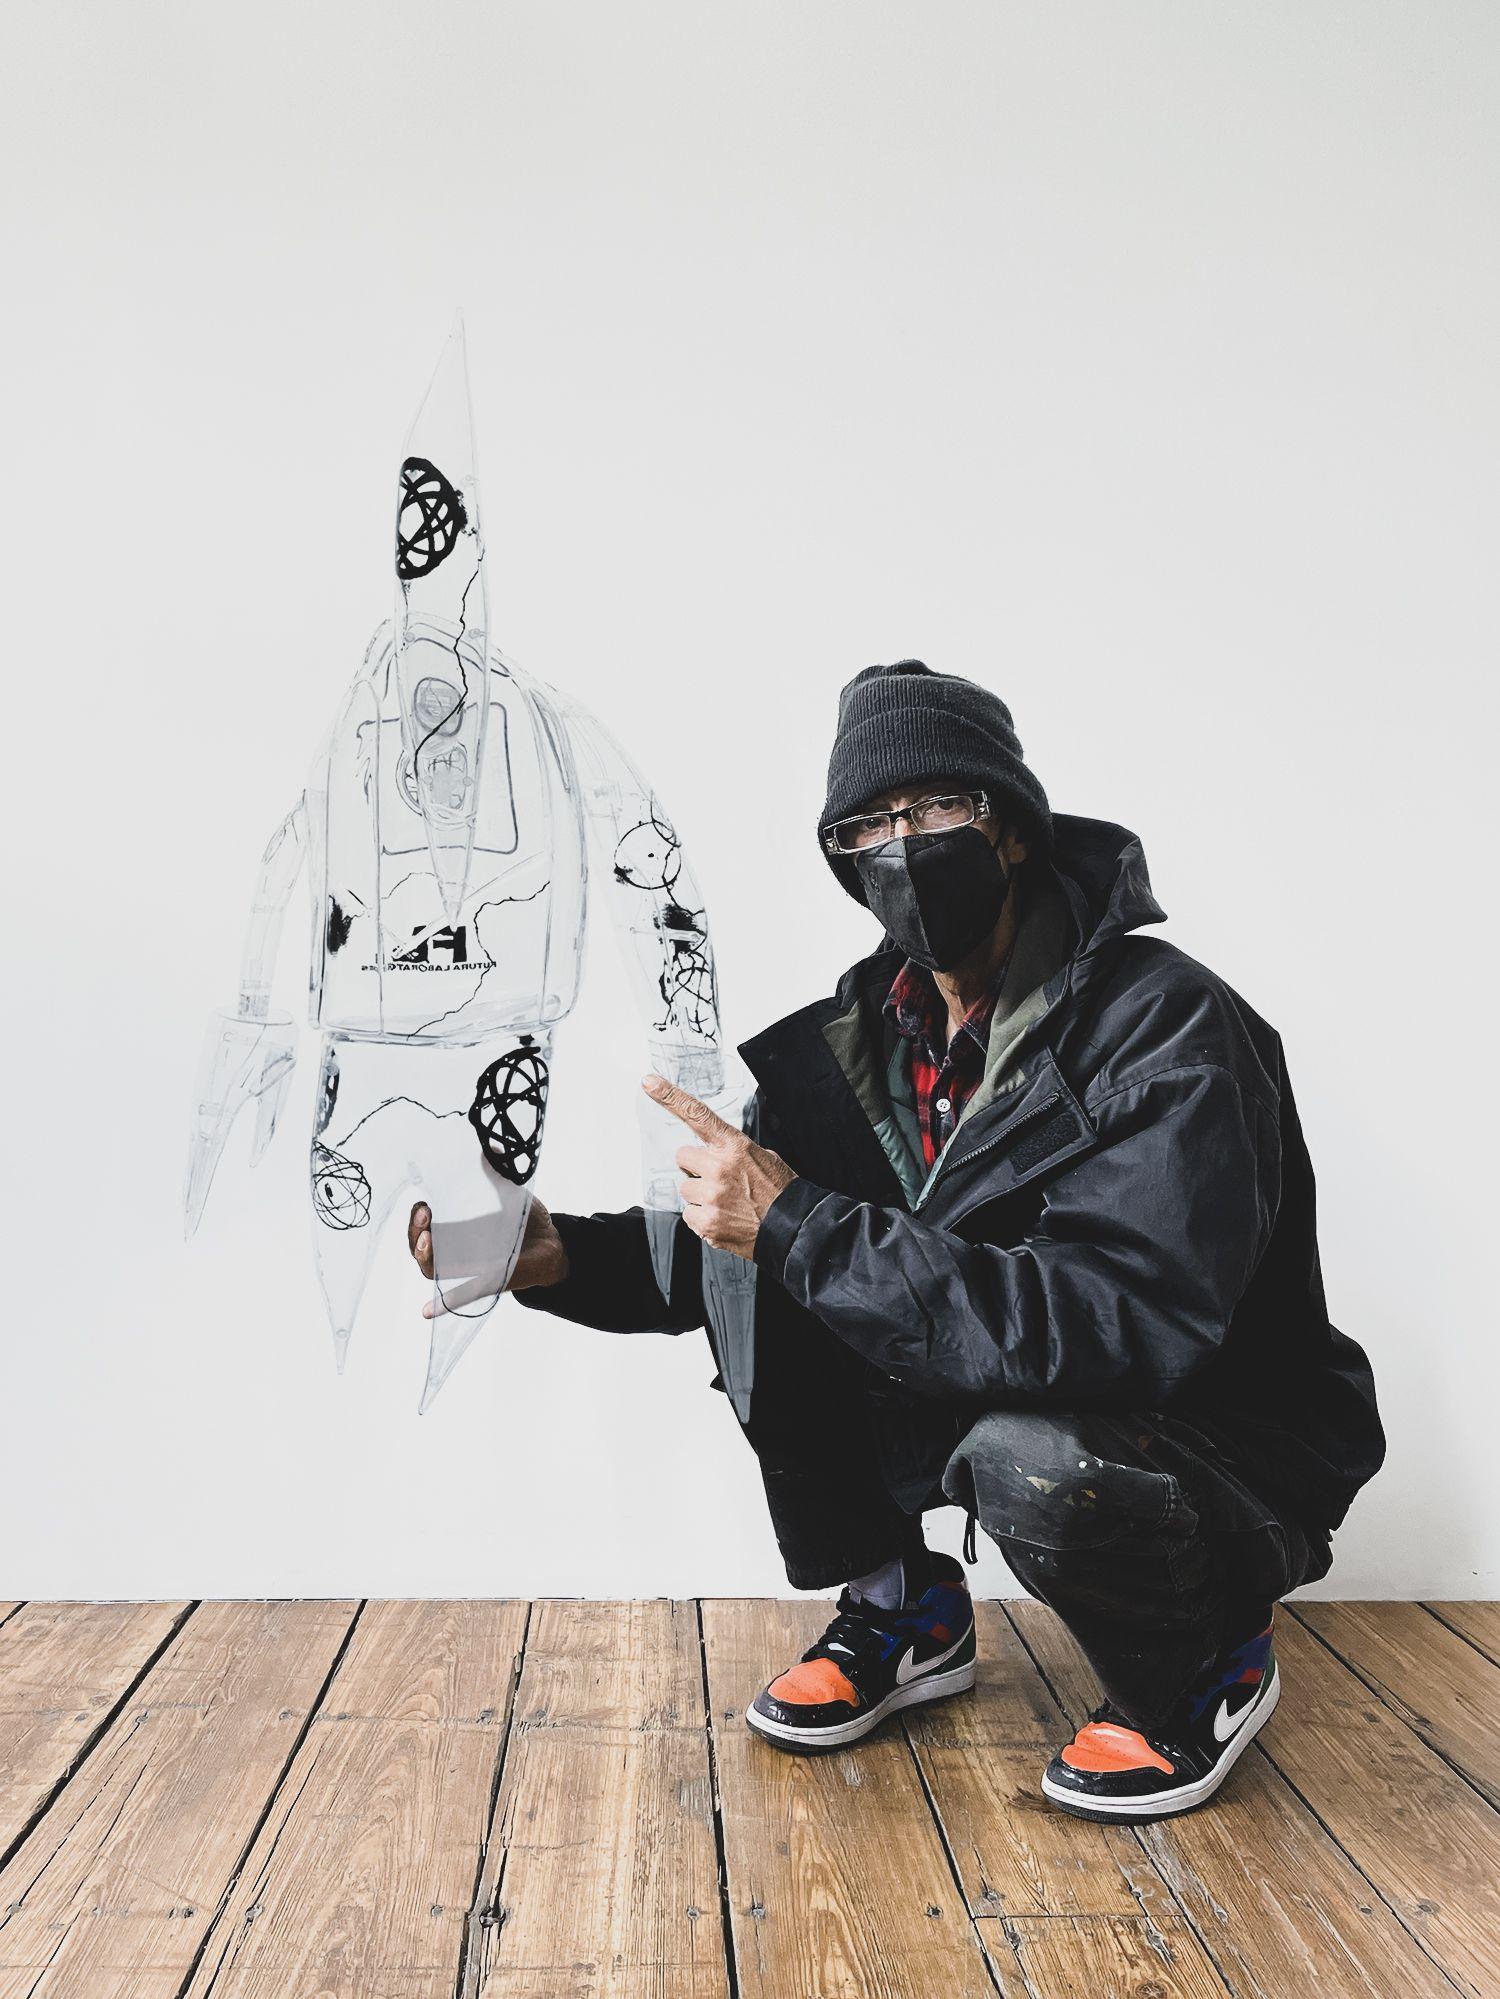 AllRightsReserved Teams Up With Graffiti Artist Futura To Host An Exhibition At Landmark Atrium